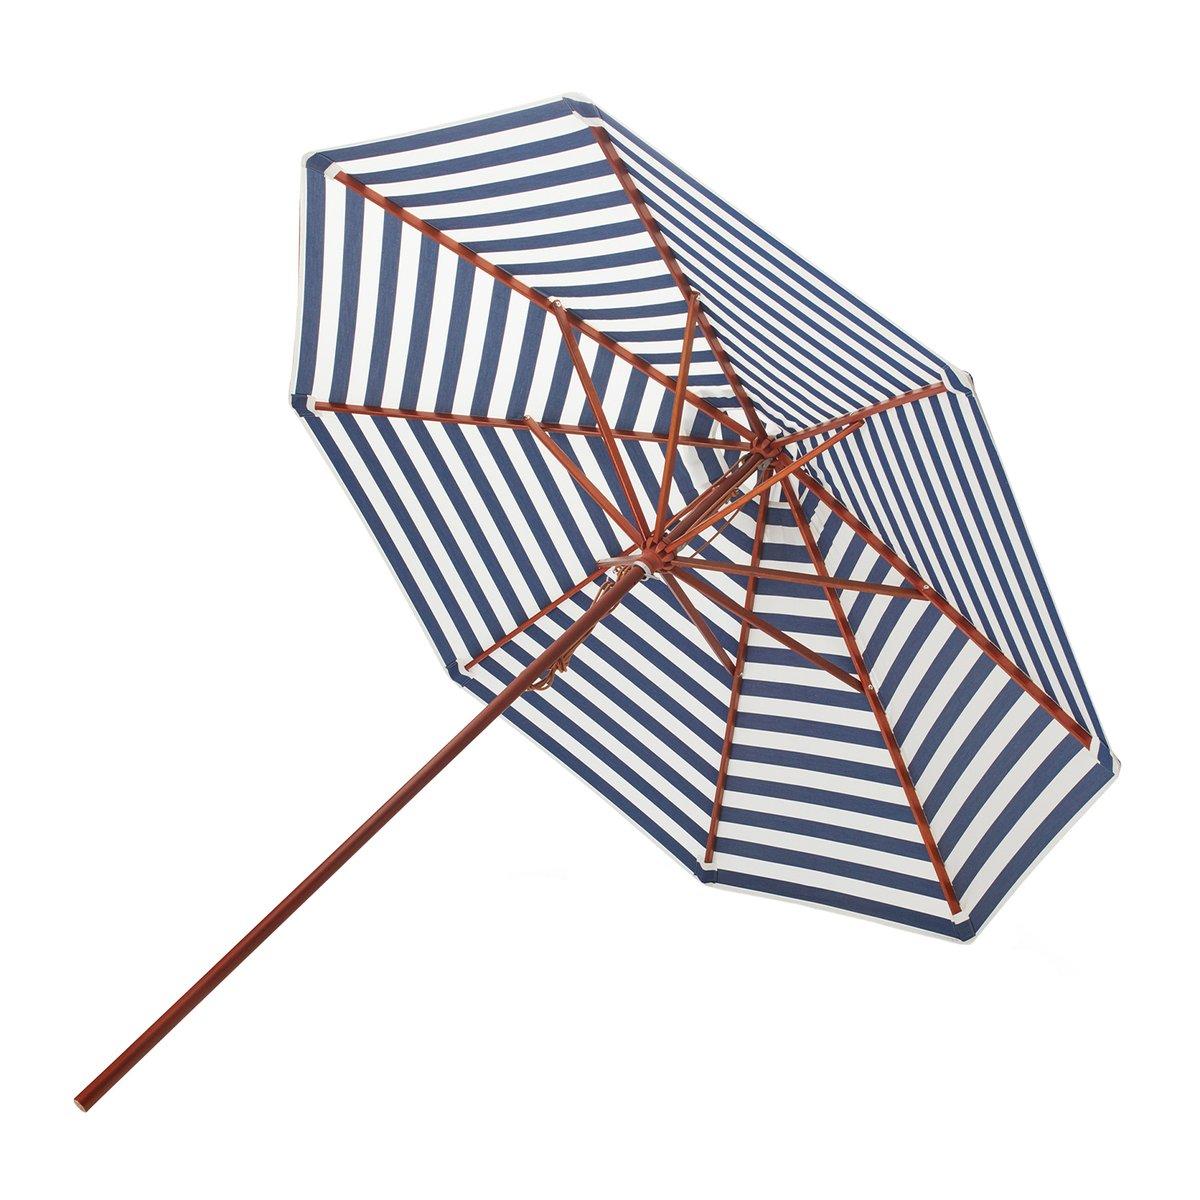 Skagerak Messina Parasol Ø 270 Cm, Striped, Blue - White